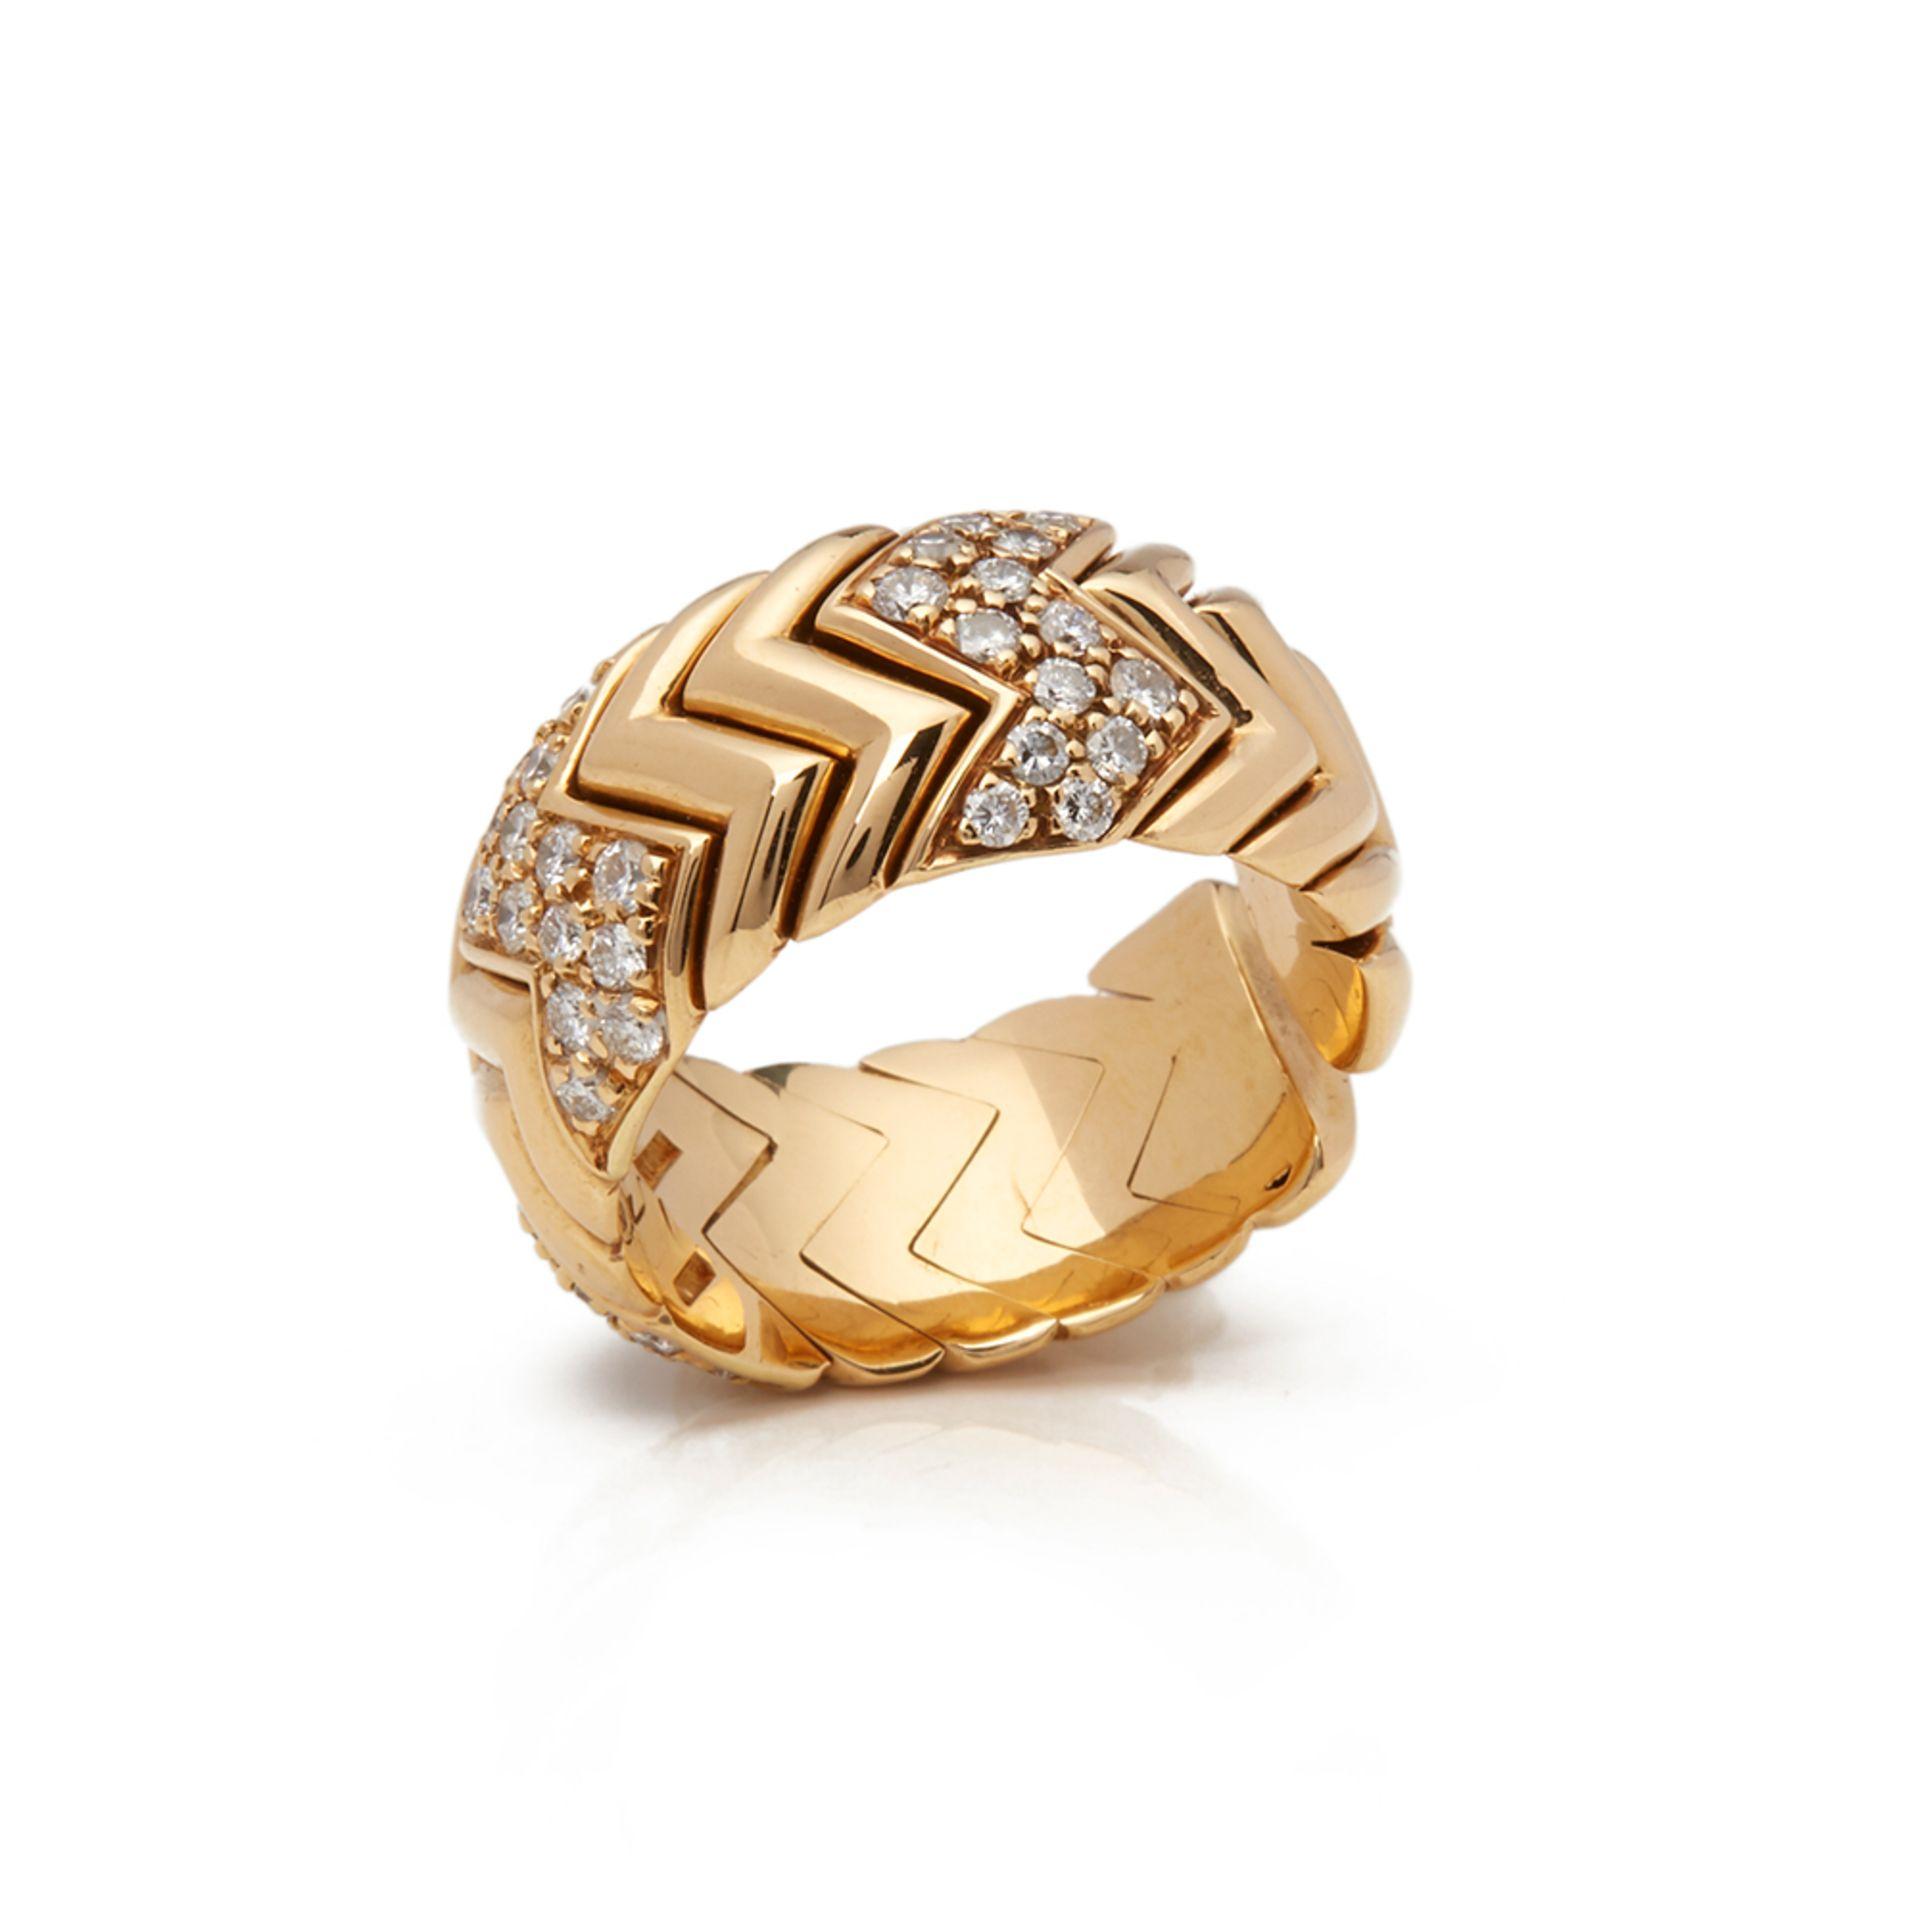 Lot 1 - 18k Yellow Gold Diamond Spiga Ring